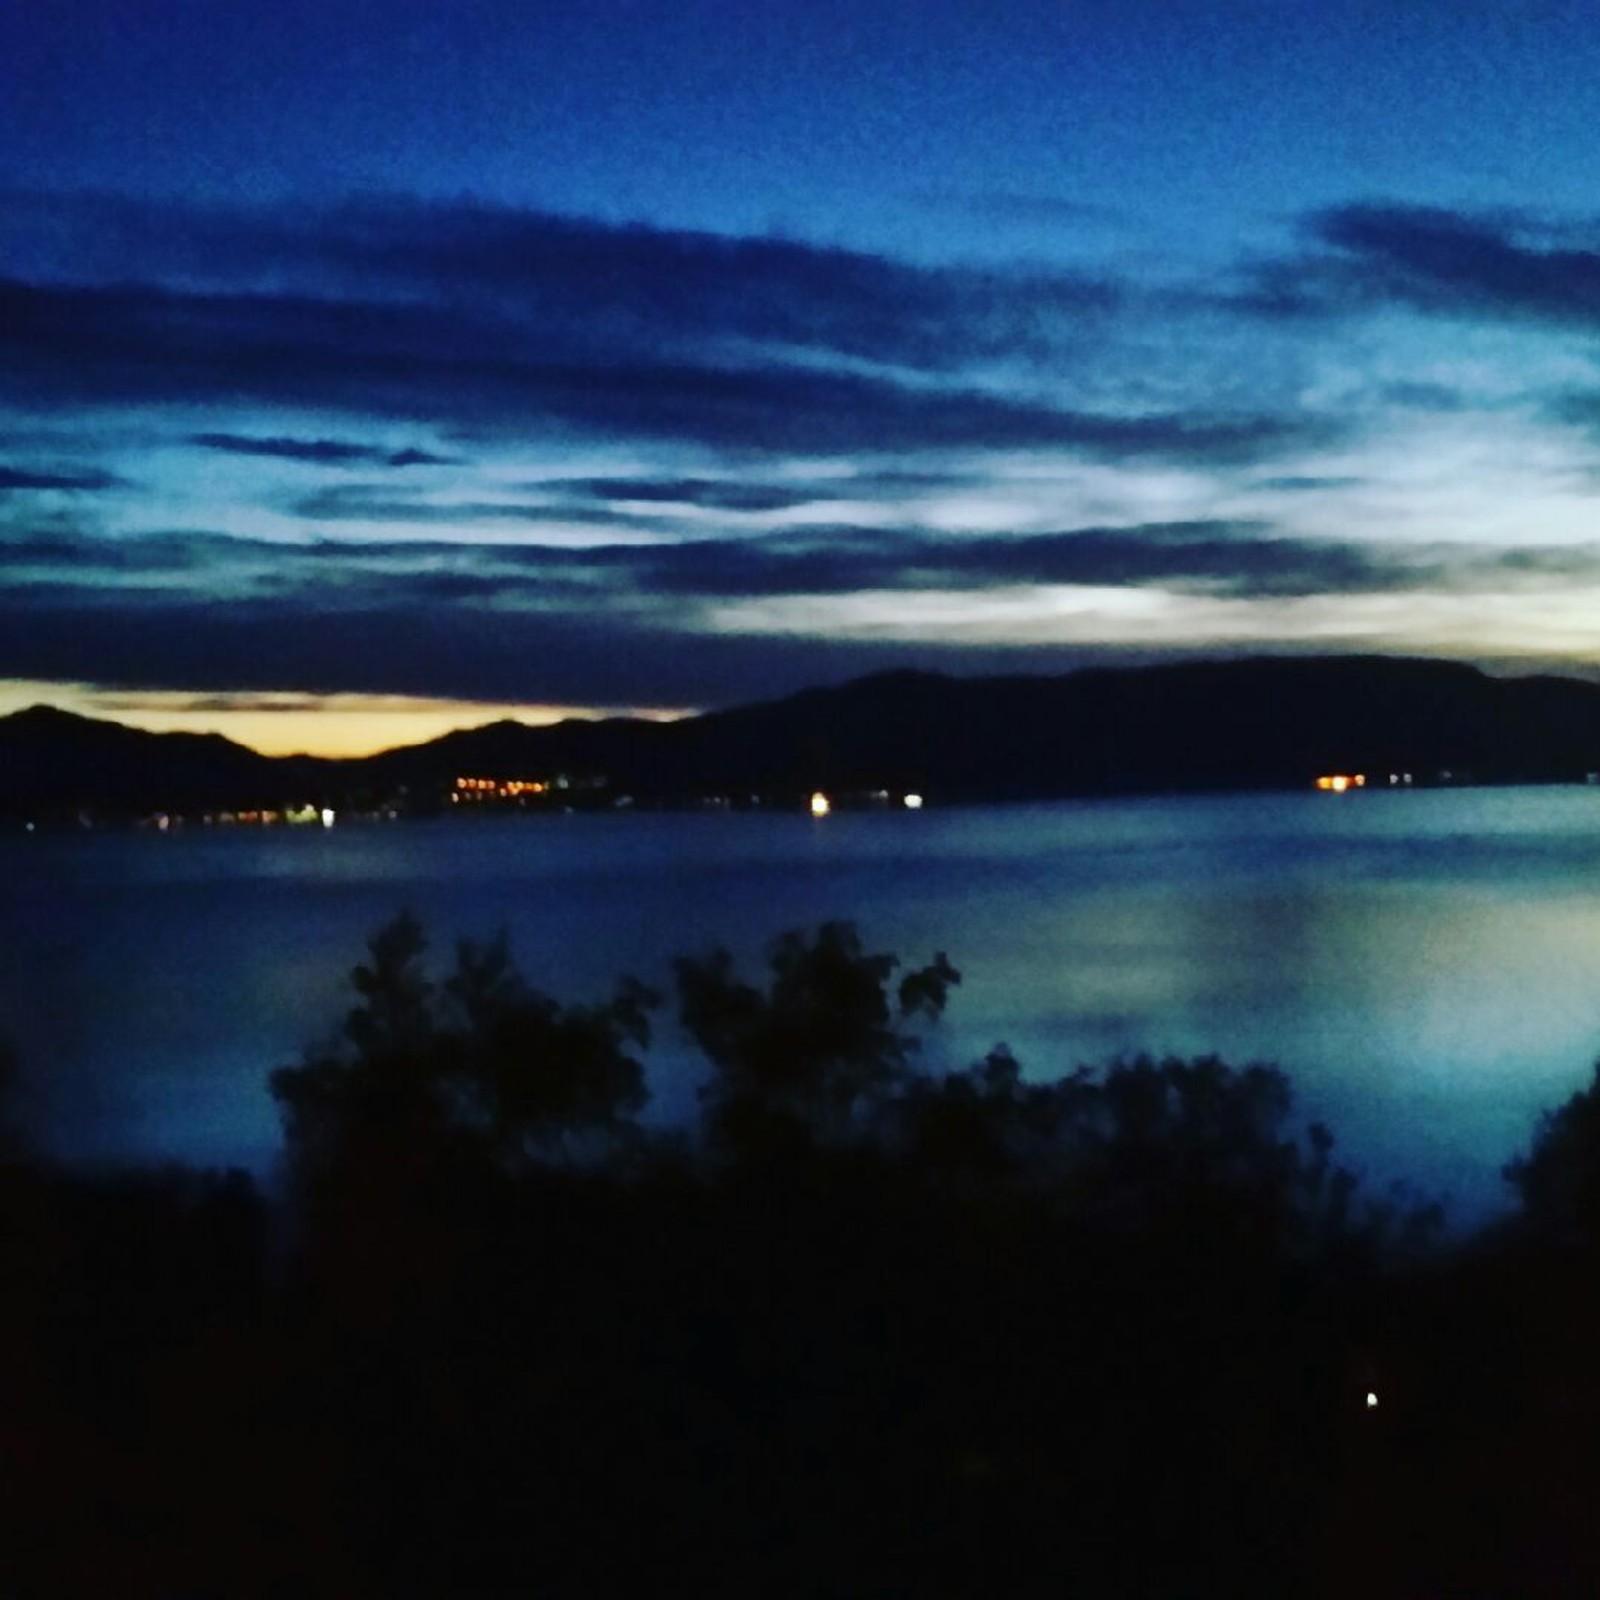 Stadlandet by night.